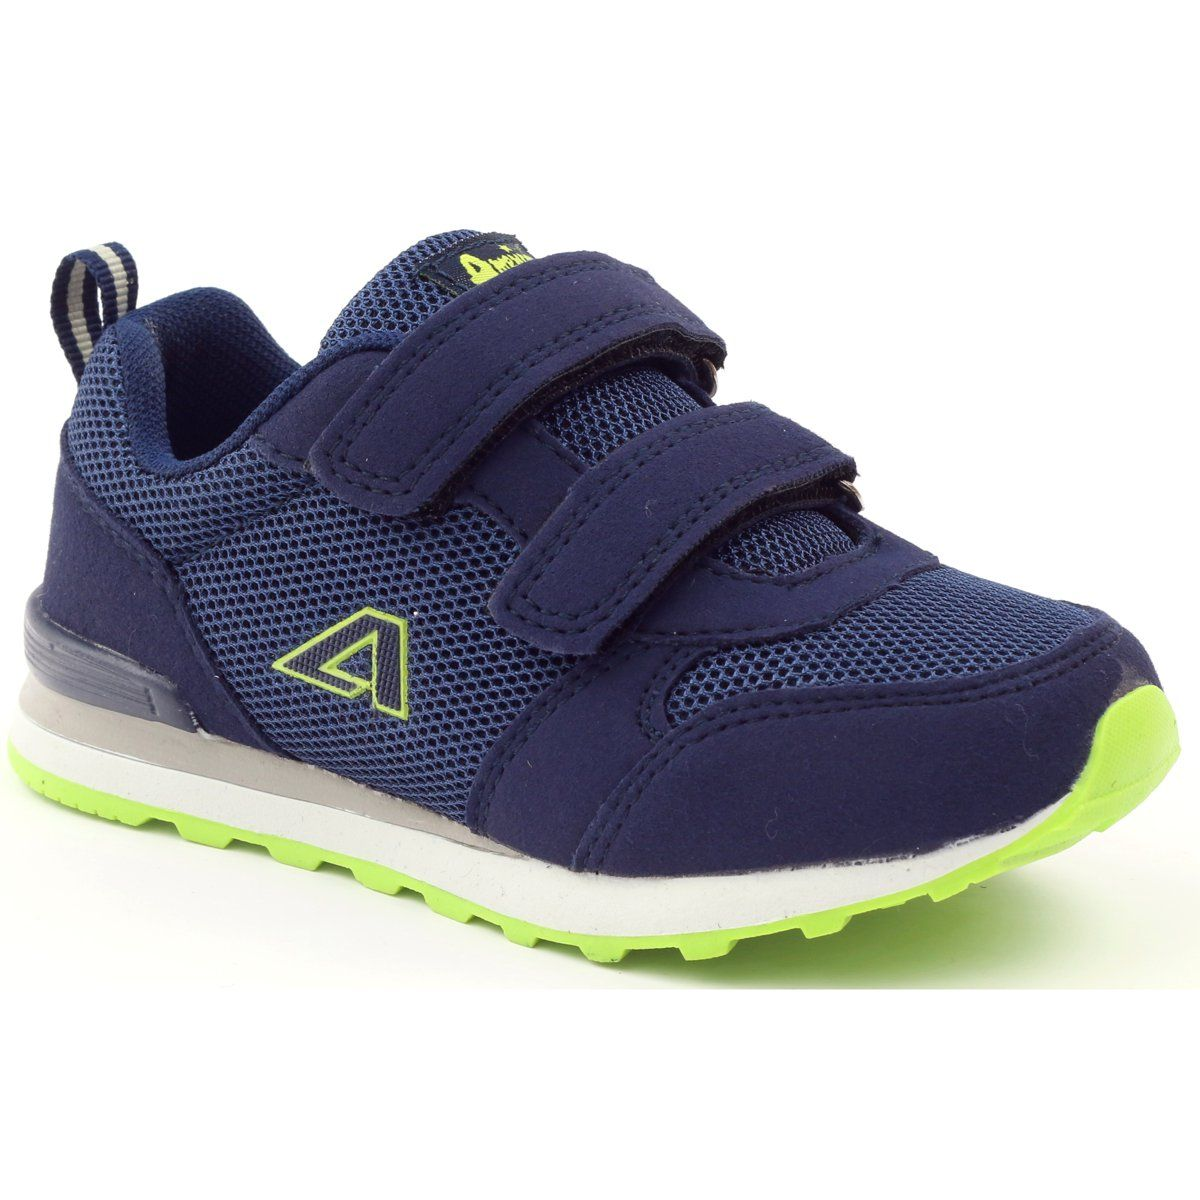 American Club Buty Sportowe Wkladka Skorzana American Winter Shoes New Balance Sneaker Shoes